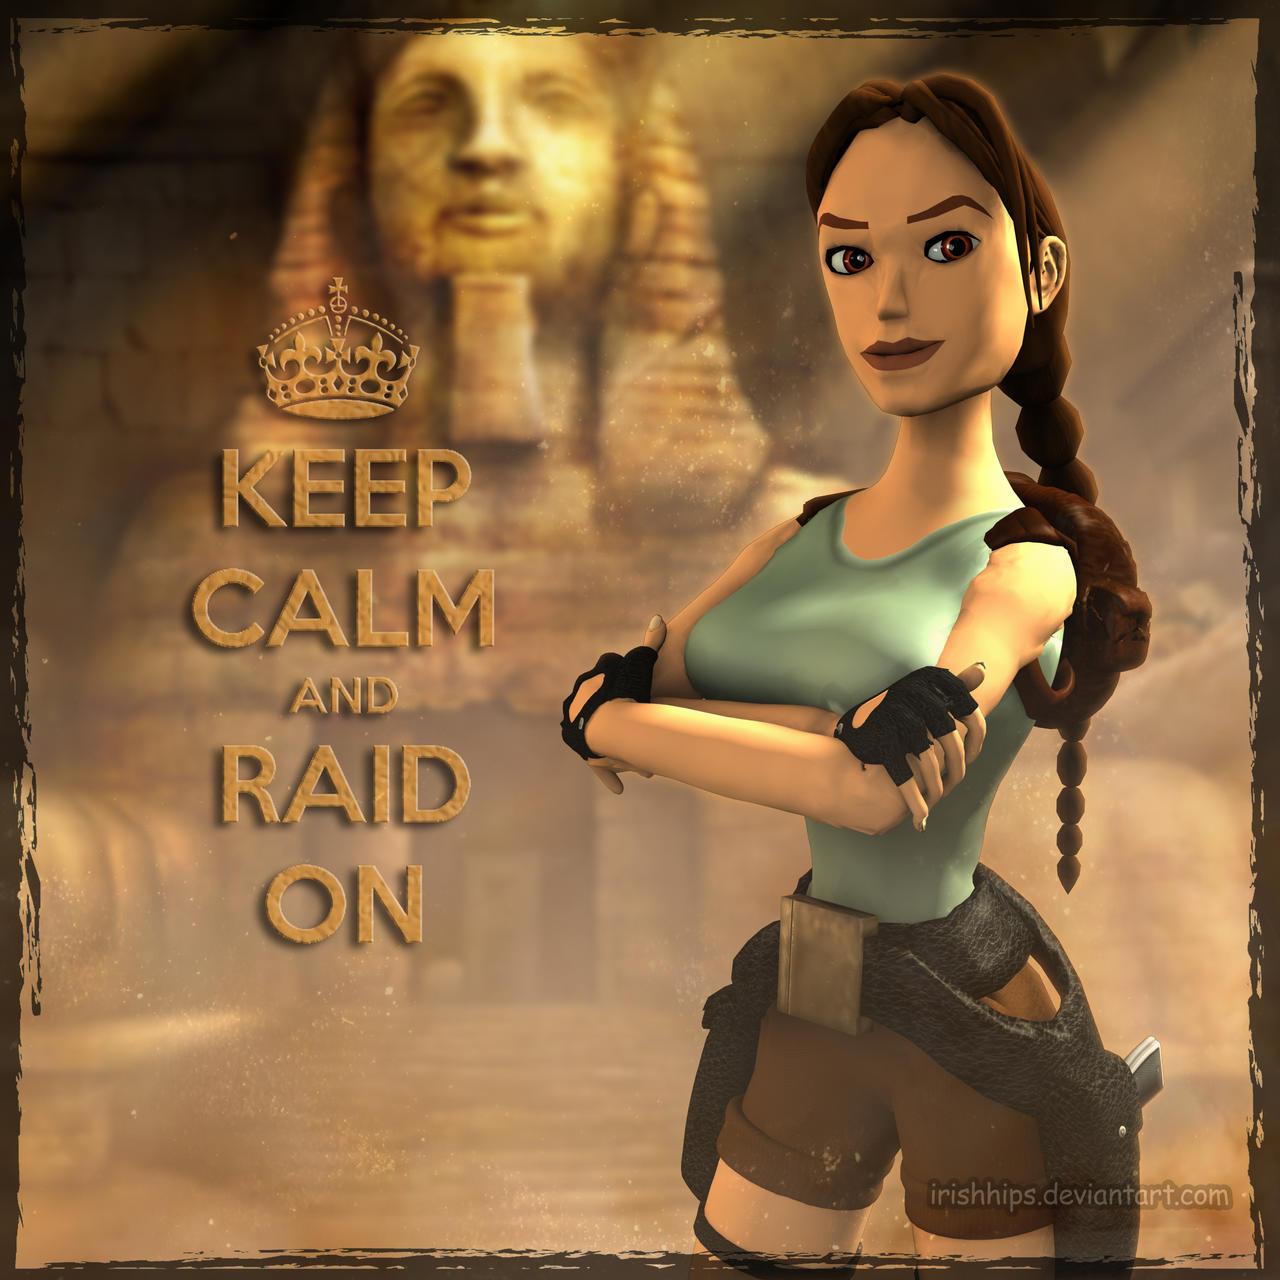 3d Tomb Raider Wallpaper: Tomb Raider Classic: Keep Calm By Irishhips On DeviantArt